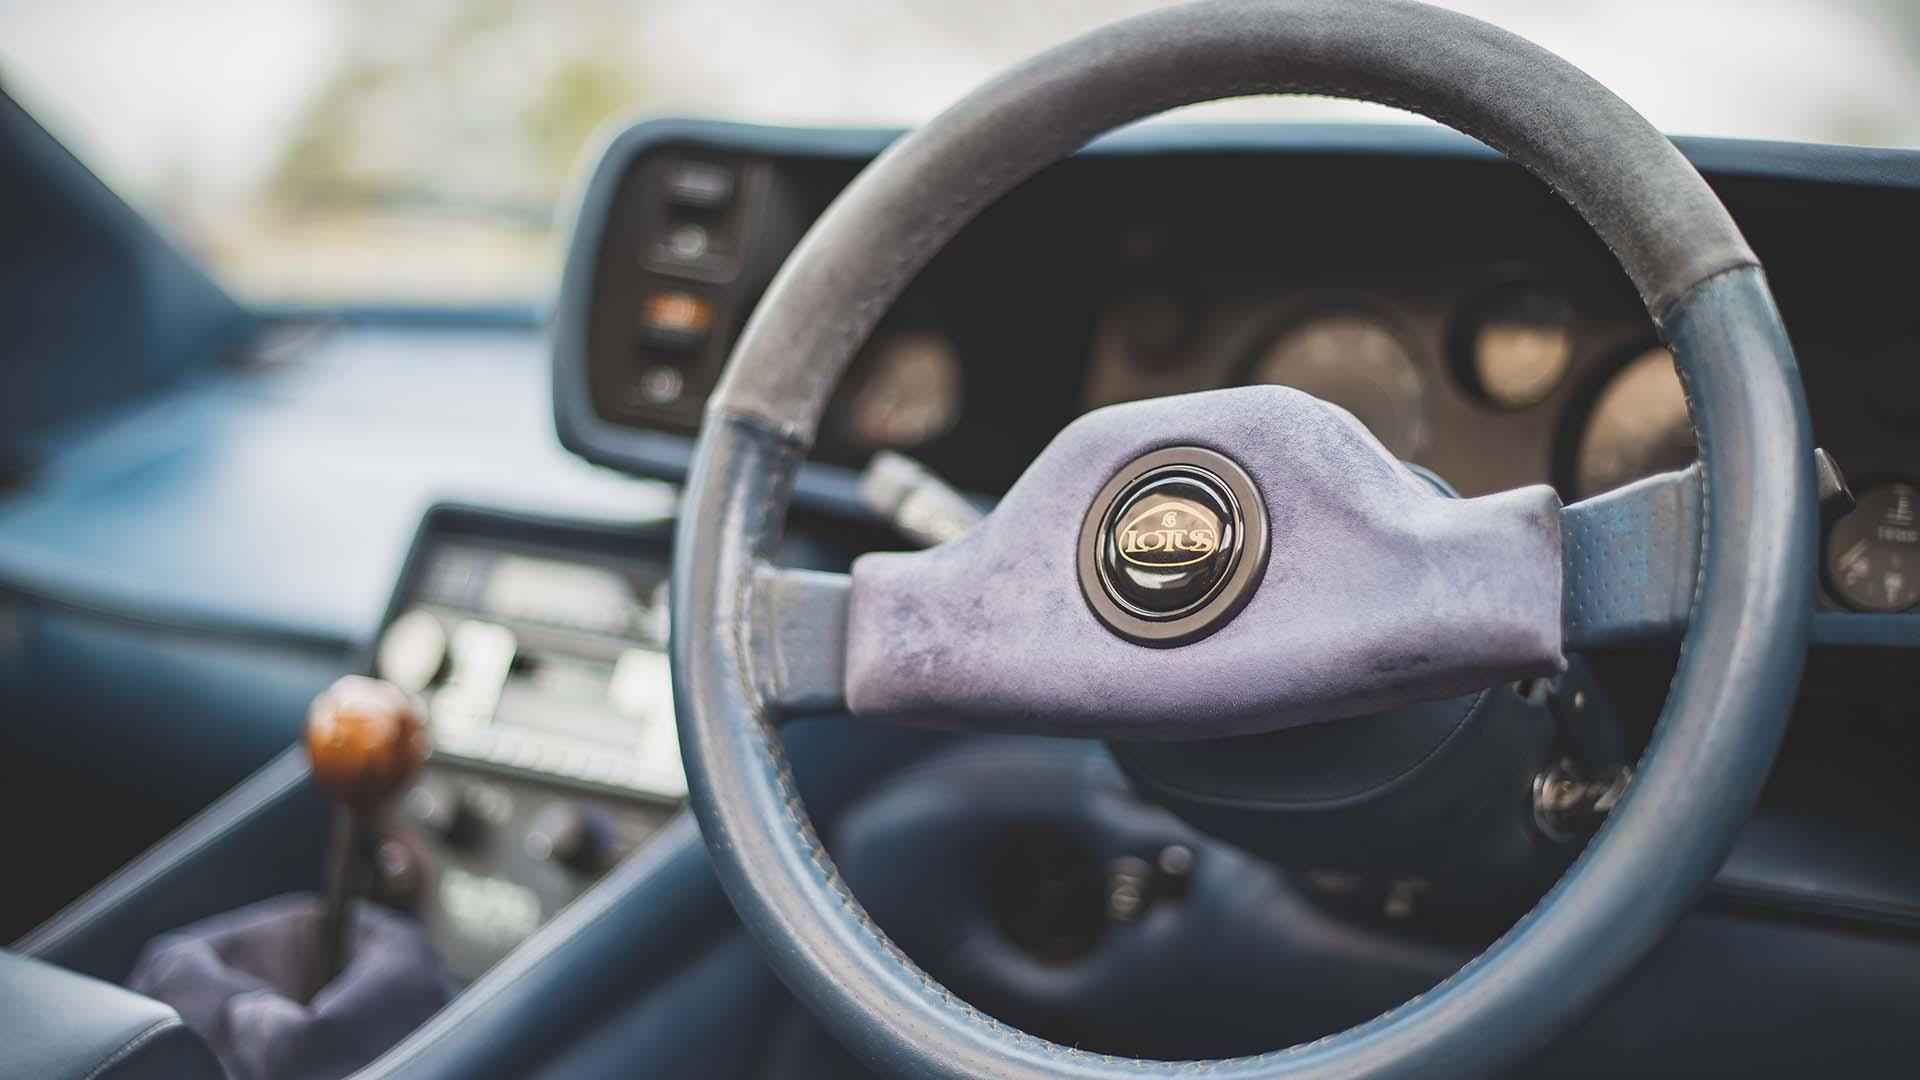 1987 LOTUS Esprit Turbo HC steering wheel